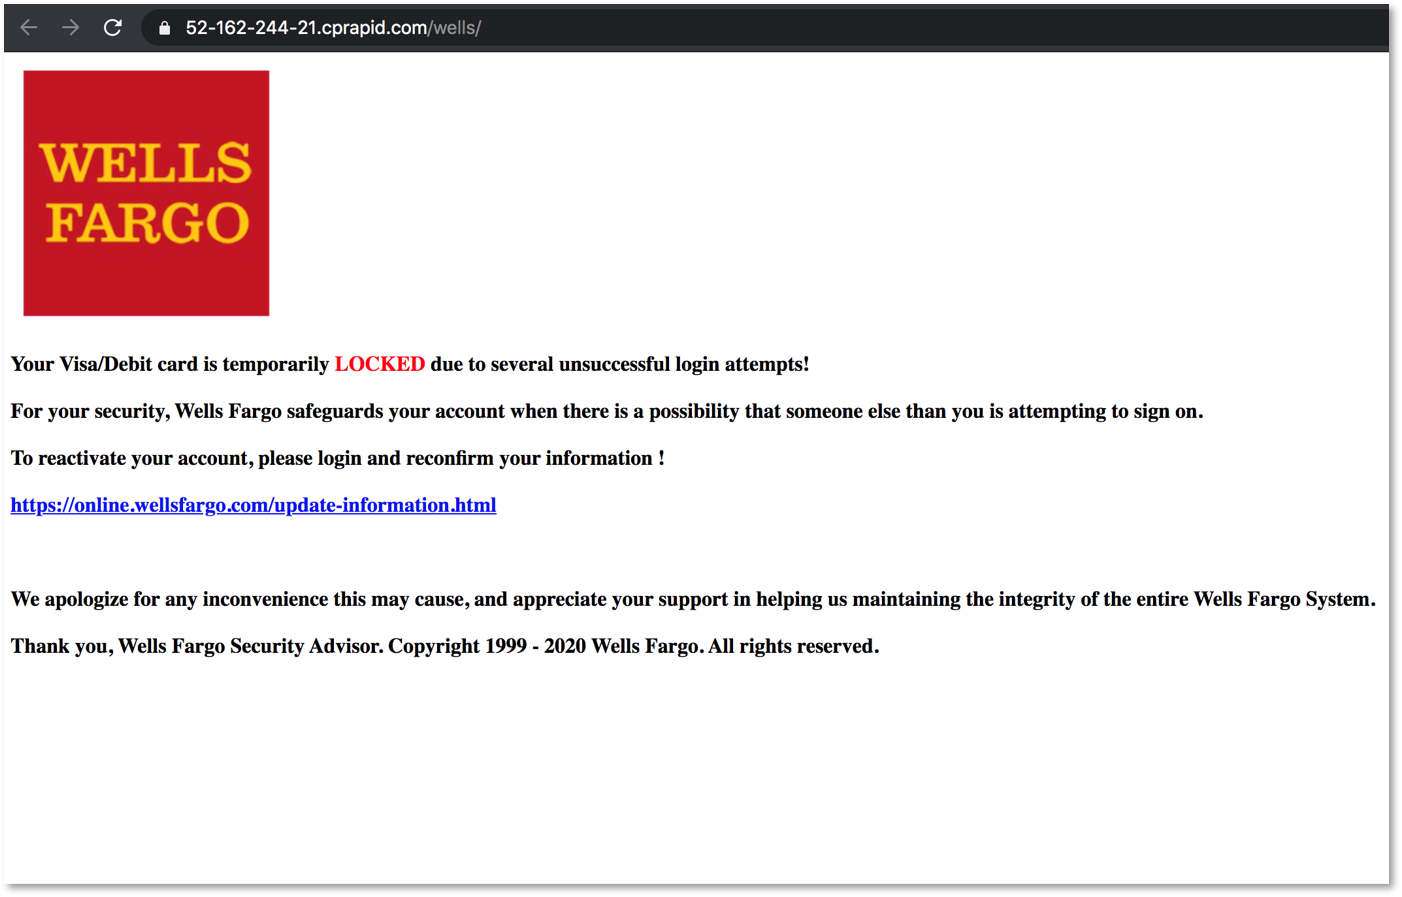 Wells Fargo locked account page